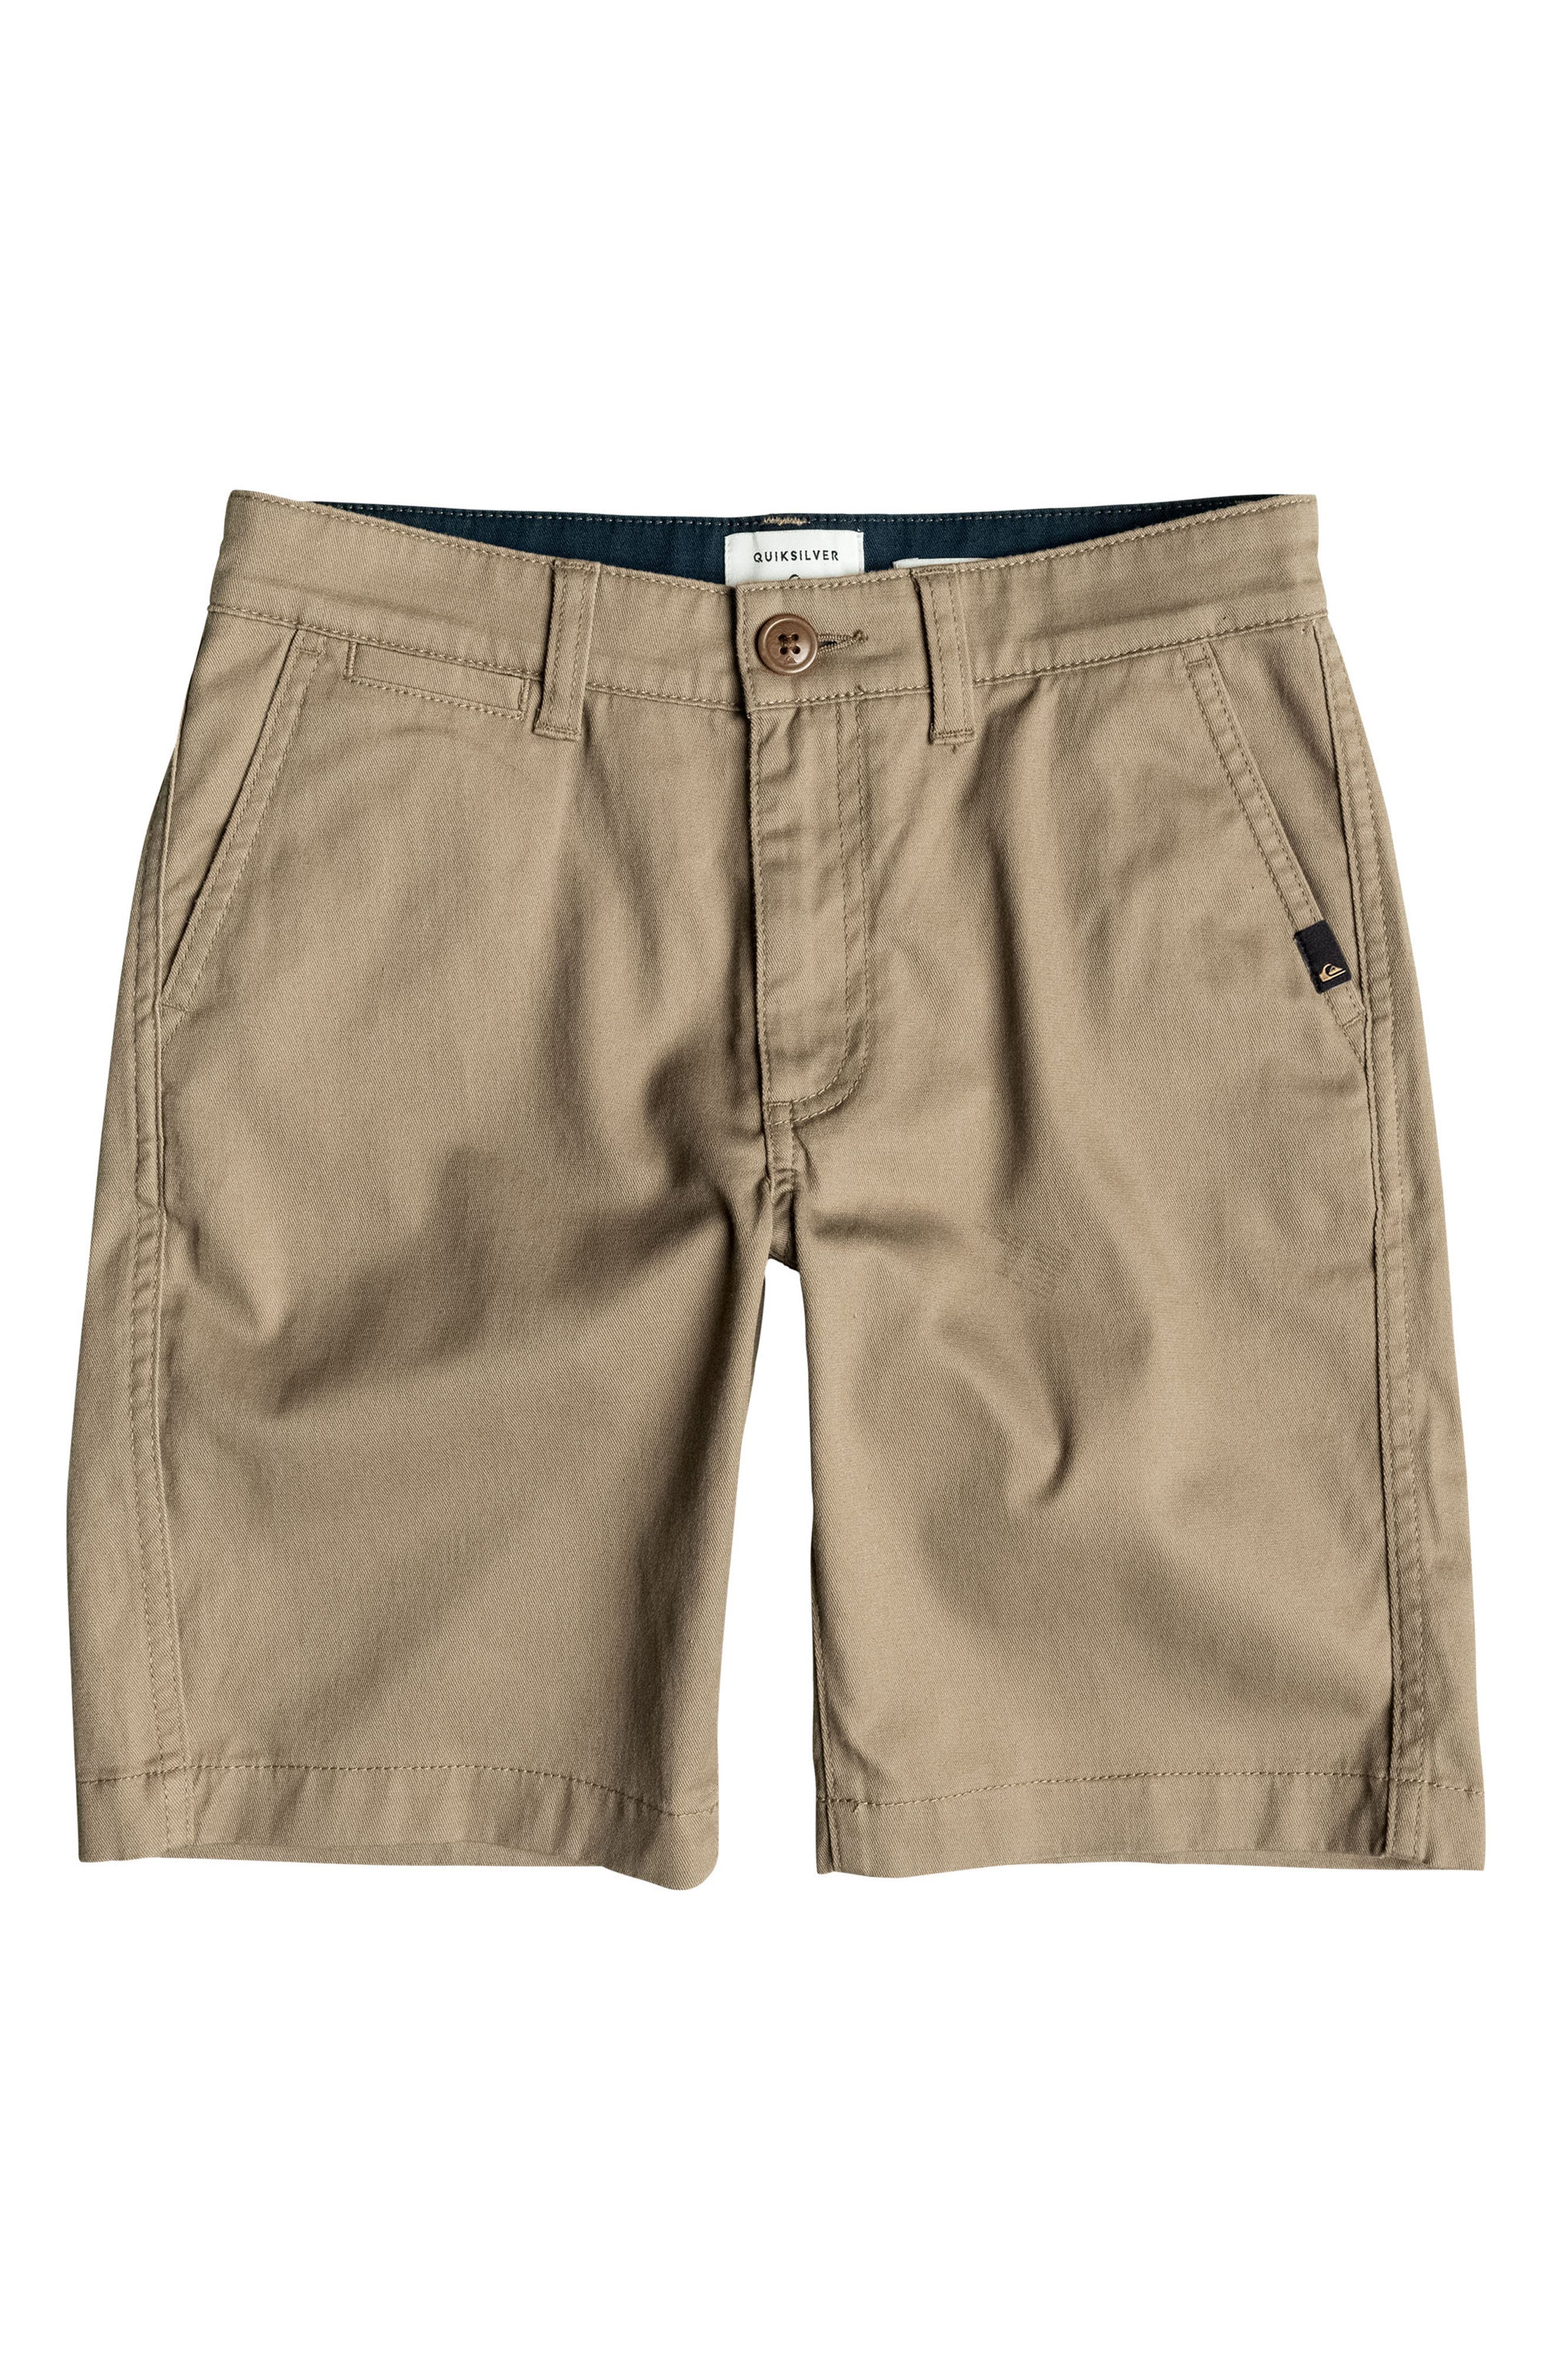 Quiksilver Regular Fit Everyday Union Shorts (Big Boys)